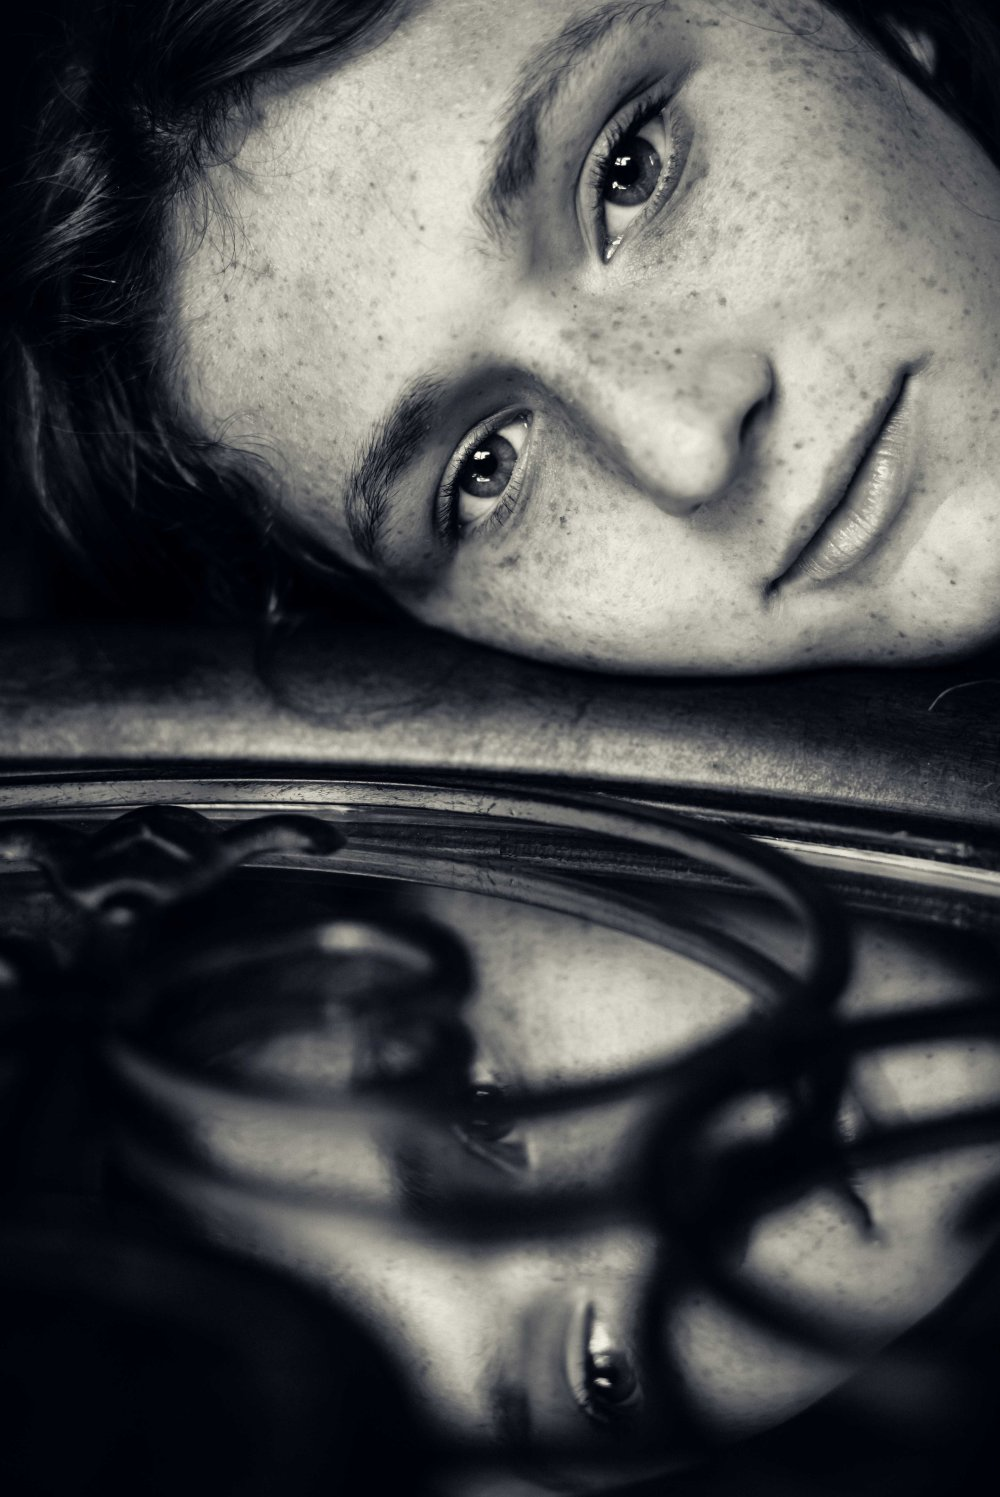 neilson portrait fine art photography bay area photographer freckles face mirror